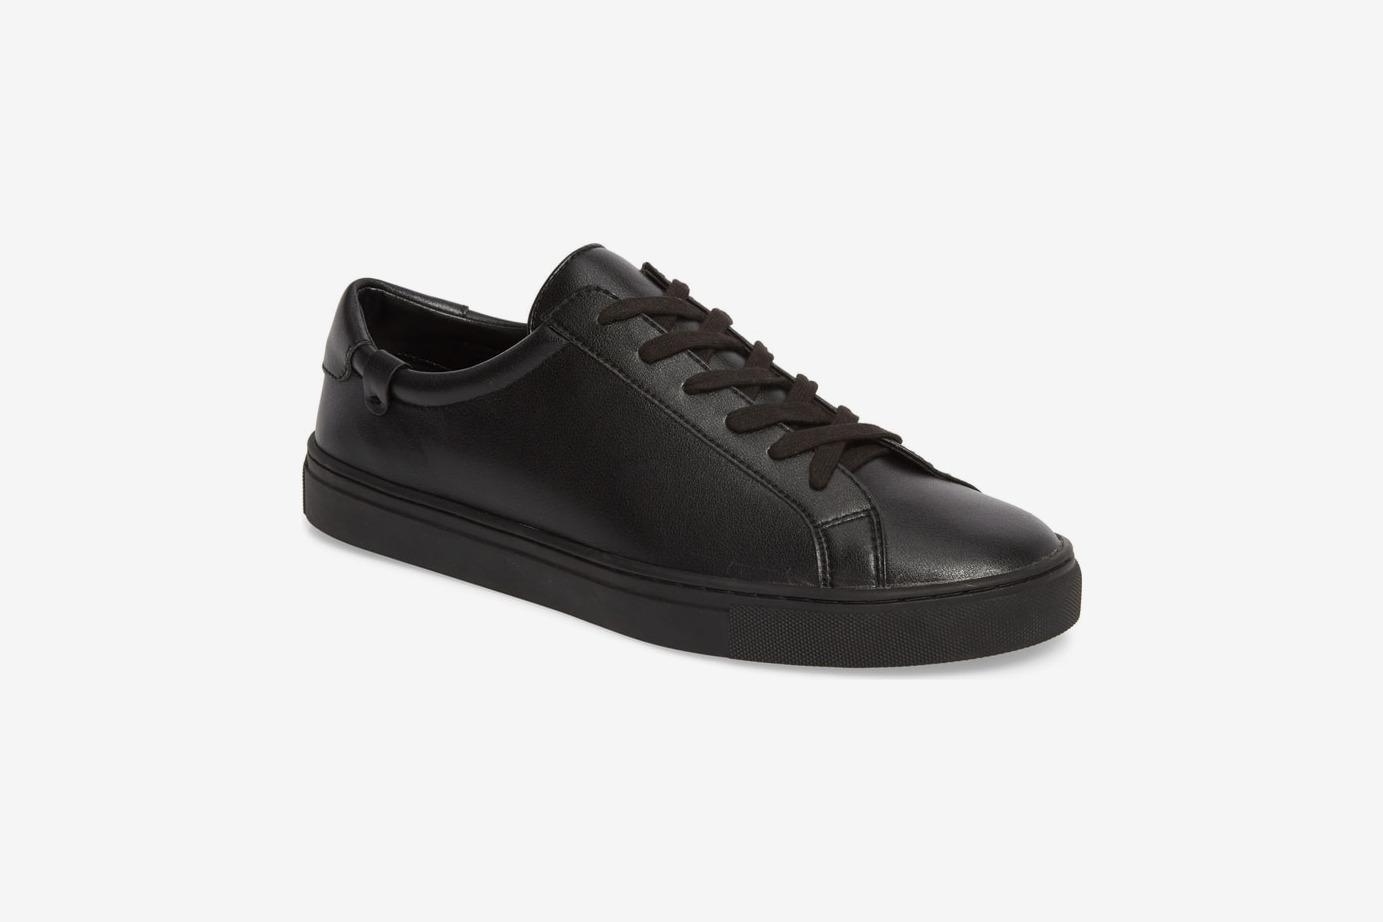 House of Future Original Low Top Sneaker